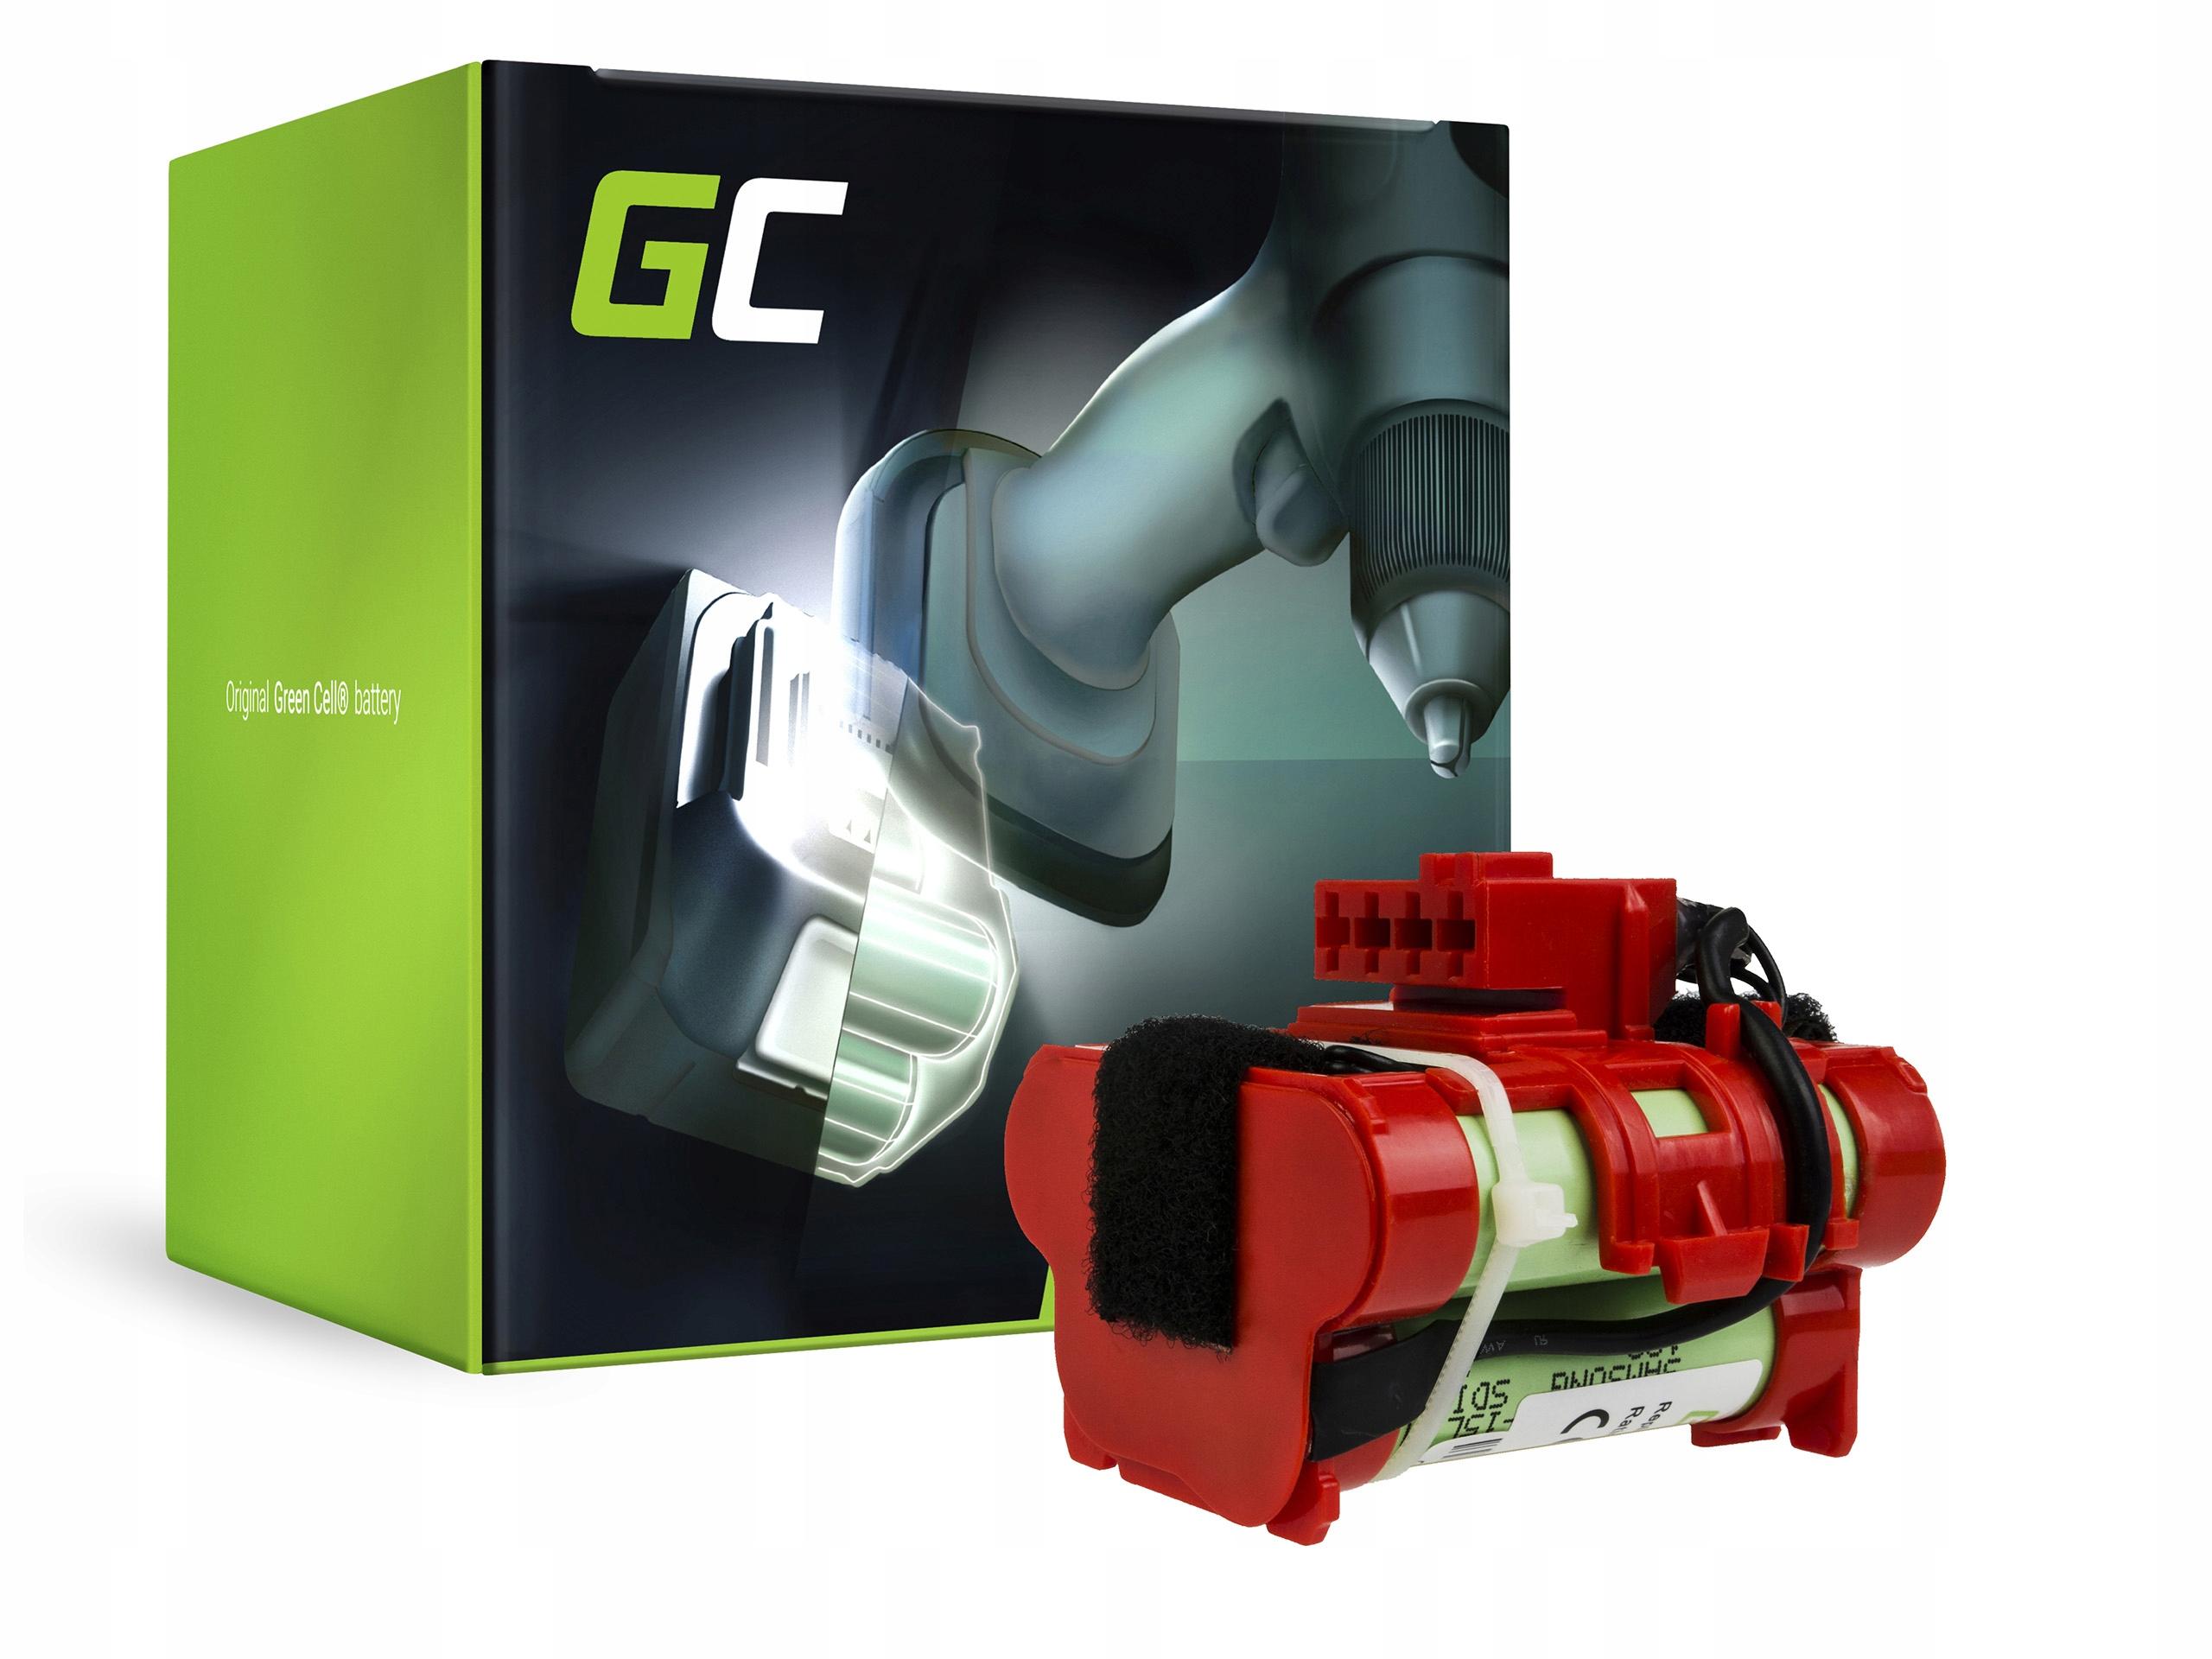 Batérie pre Husqvarna Automower 305 2012